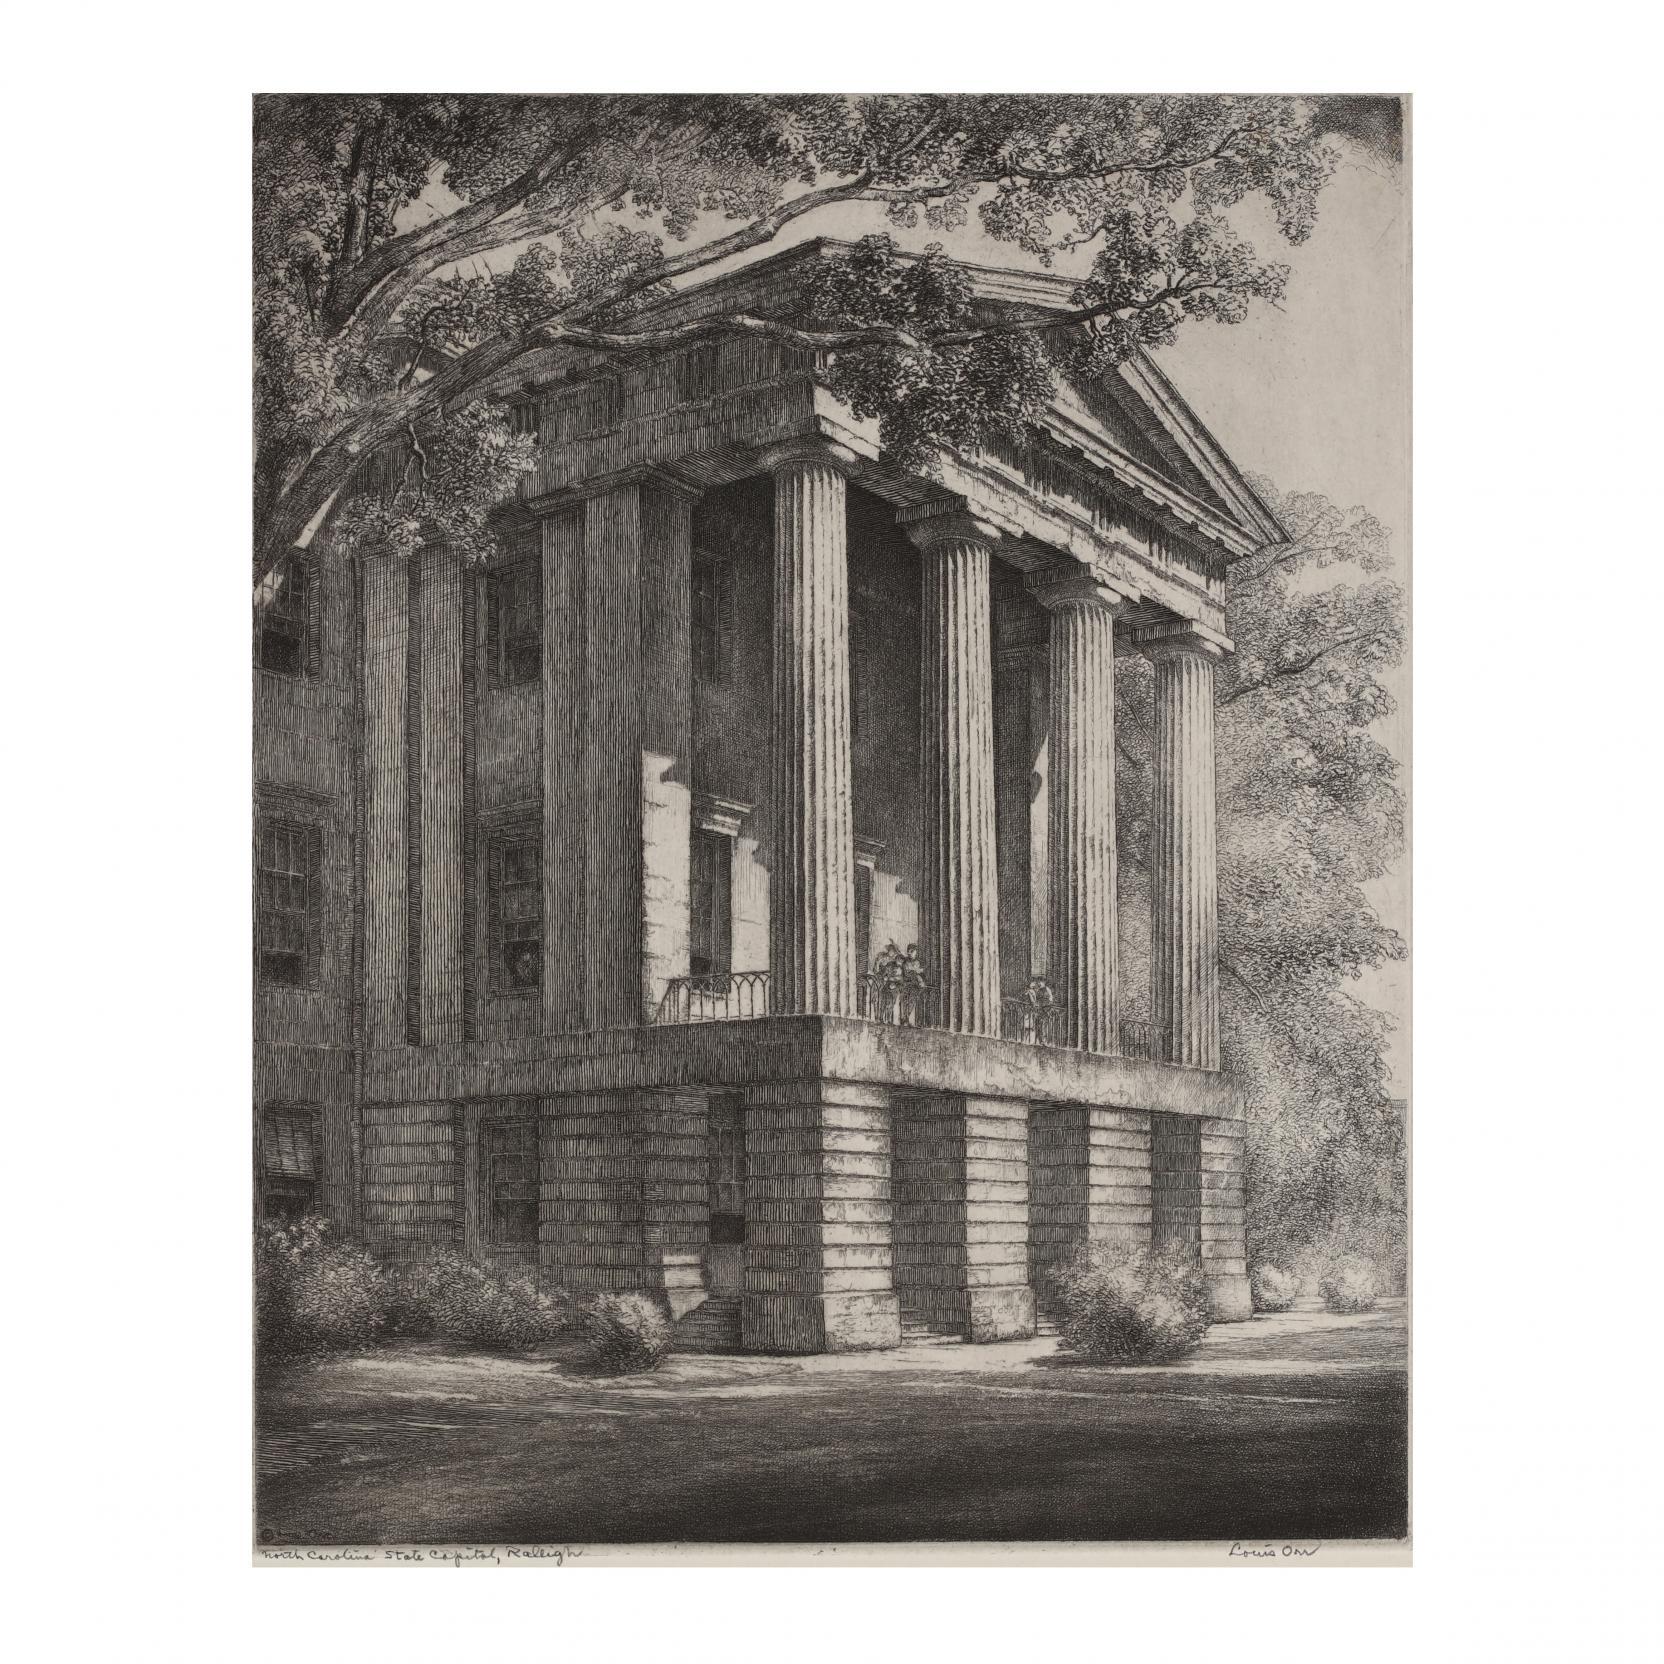 louis-orr-american-1879-1961-i-north-carolina-state-capitol-west-porch-raleigh-north-carolina-i